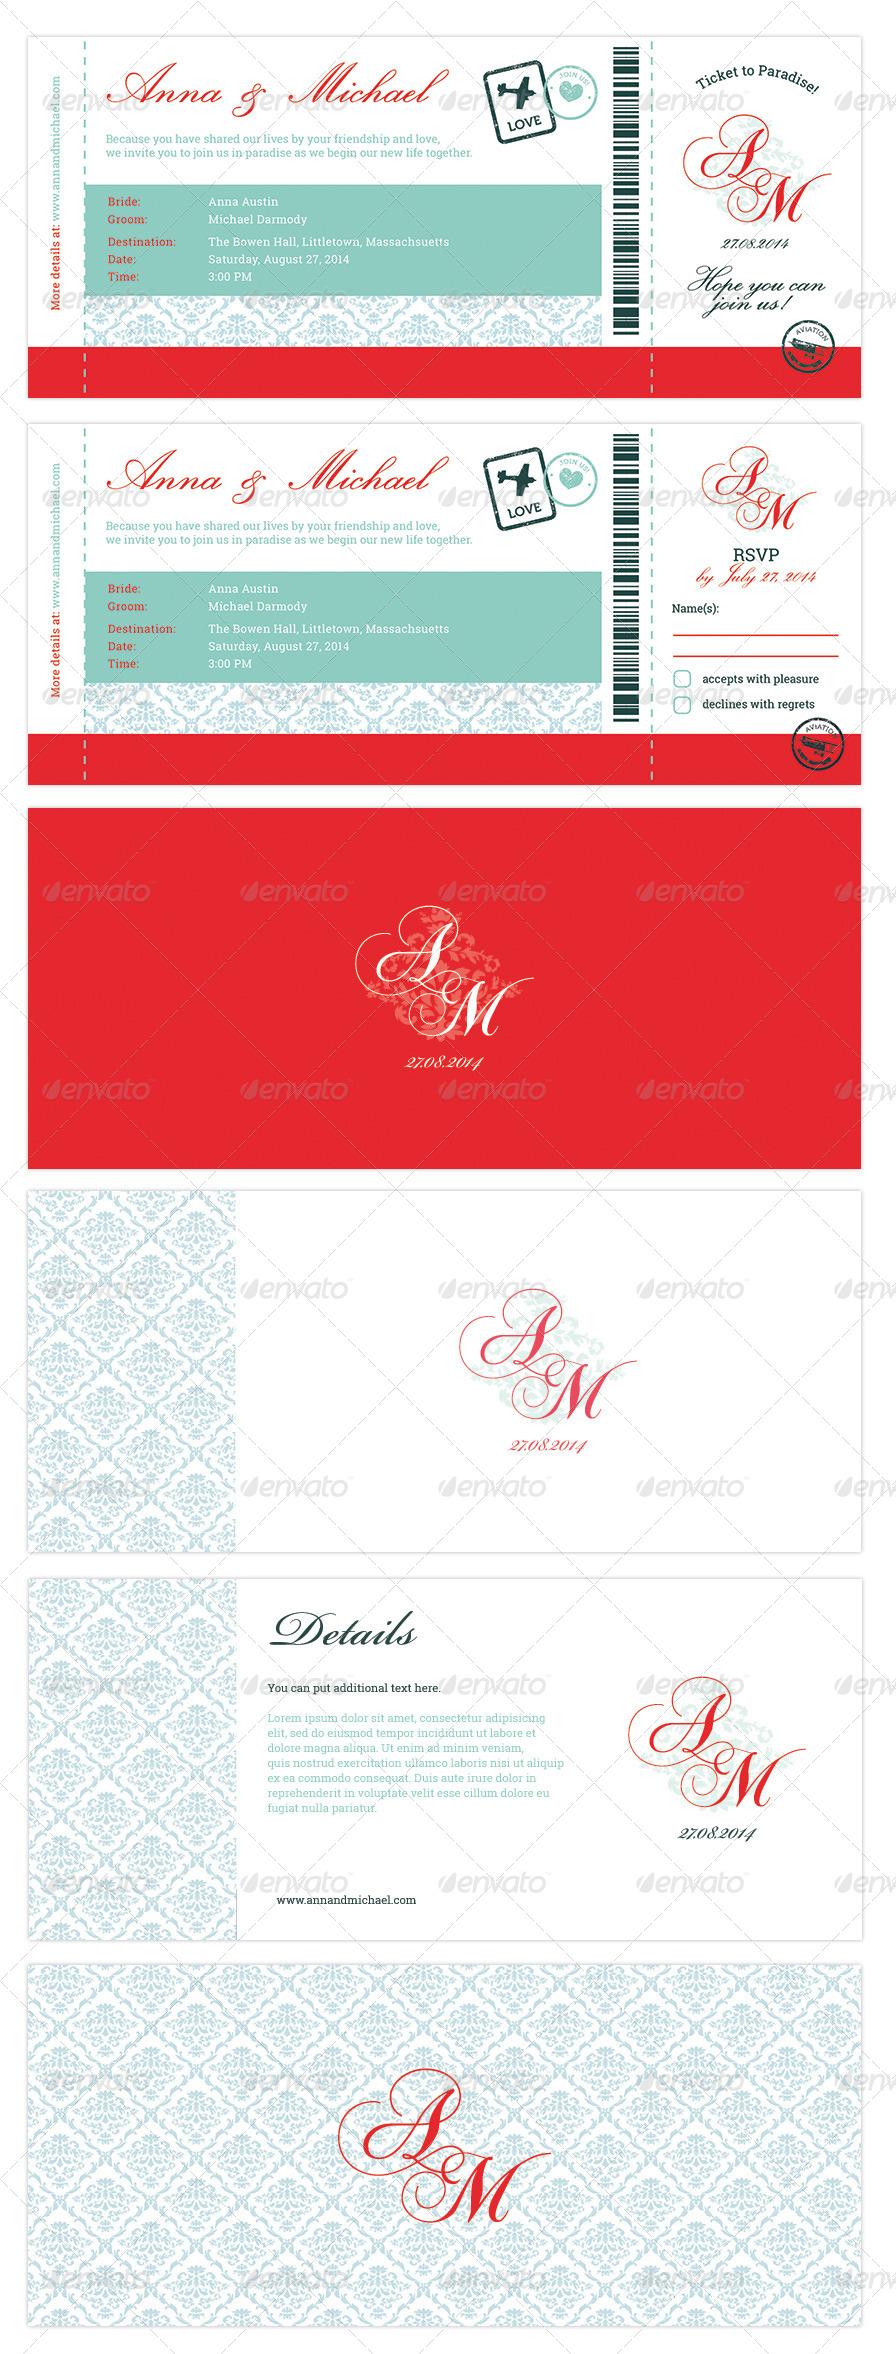 Elegant Boarding Pass Wedding Invitation RSVP by ejanas | GraphicRiver